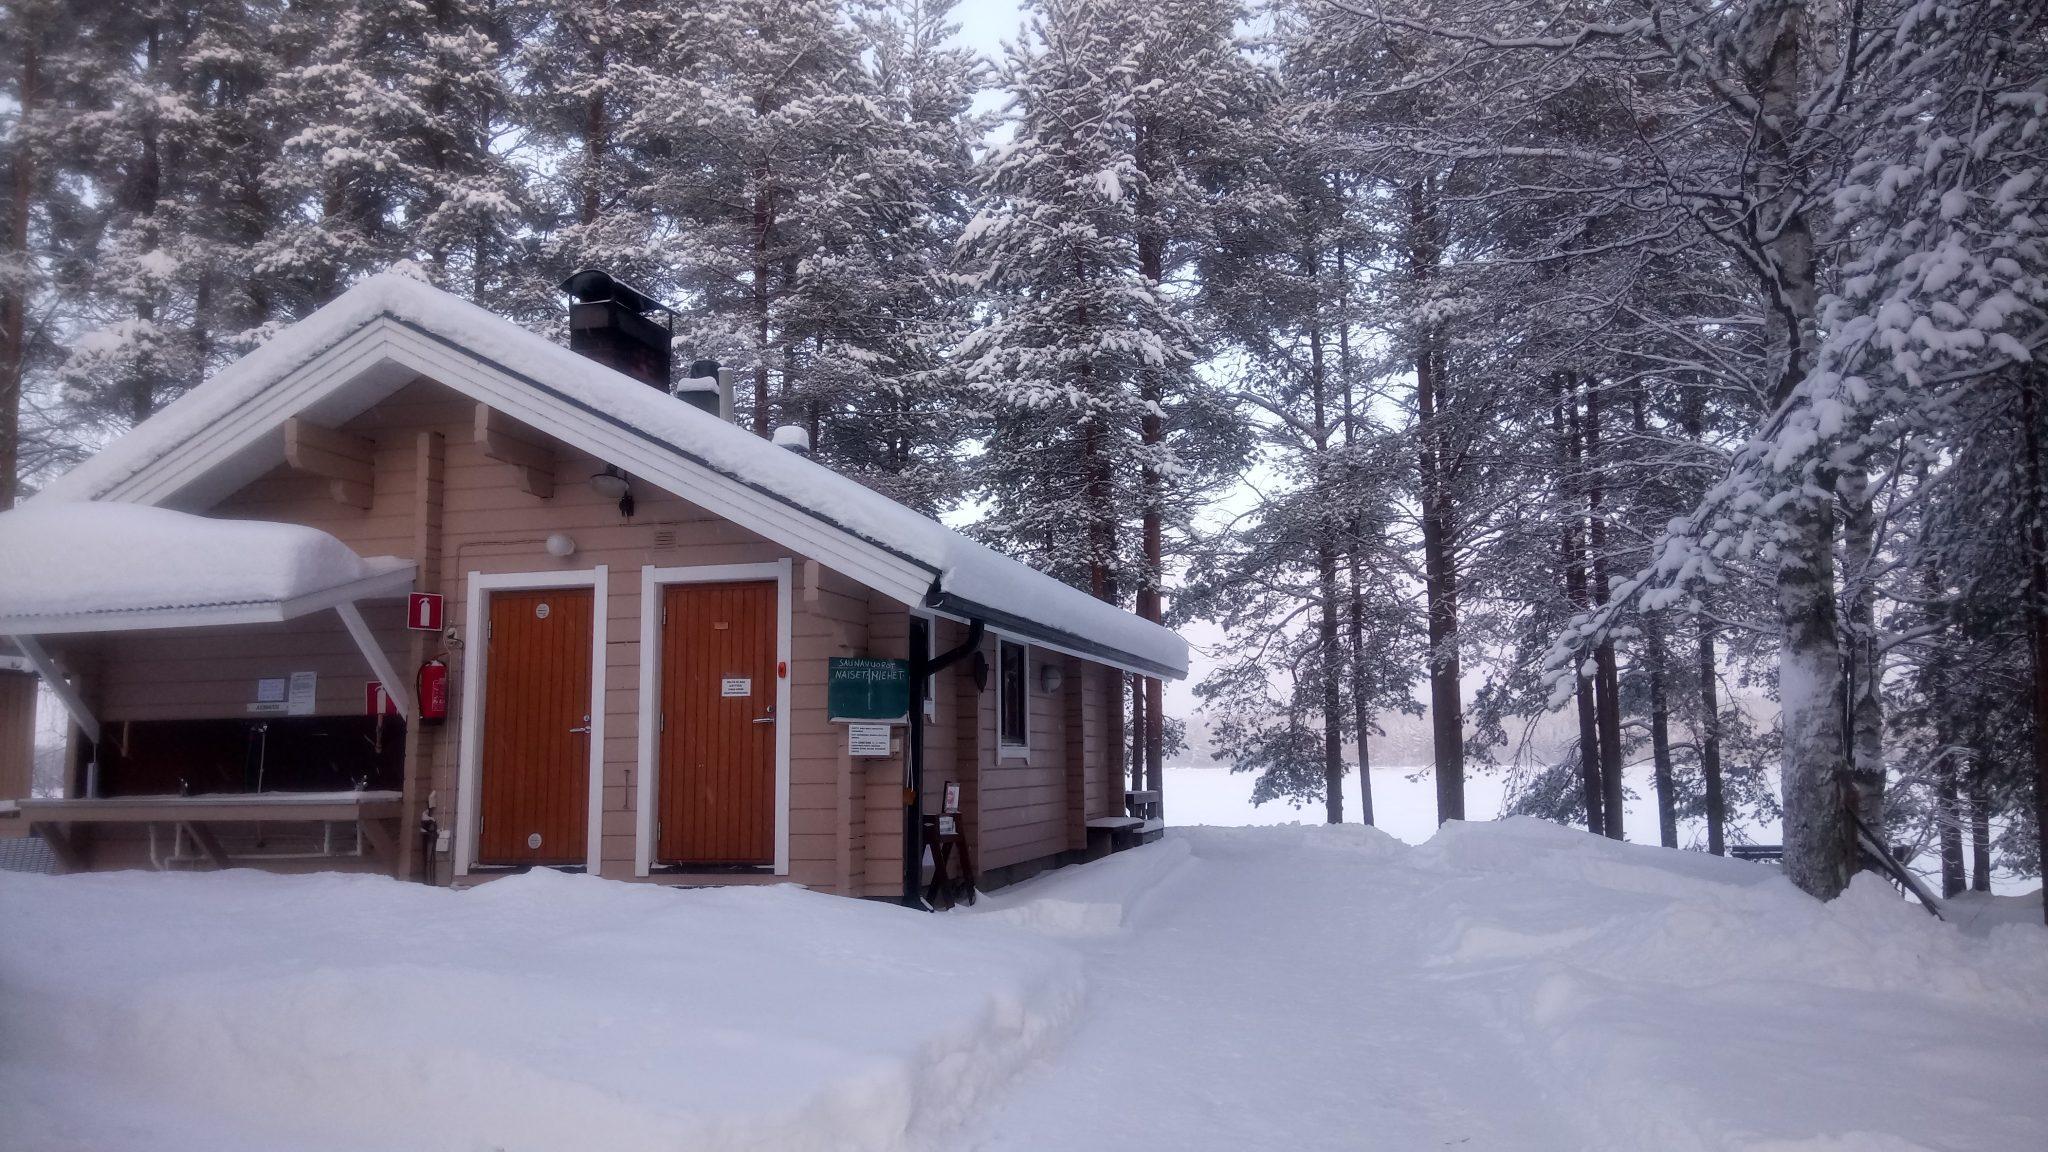 The sauna building of Rekiniemi